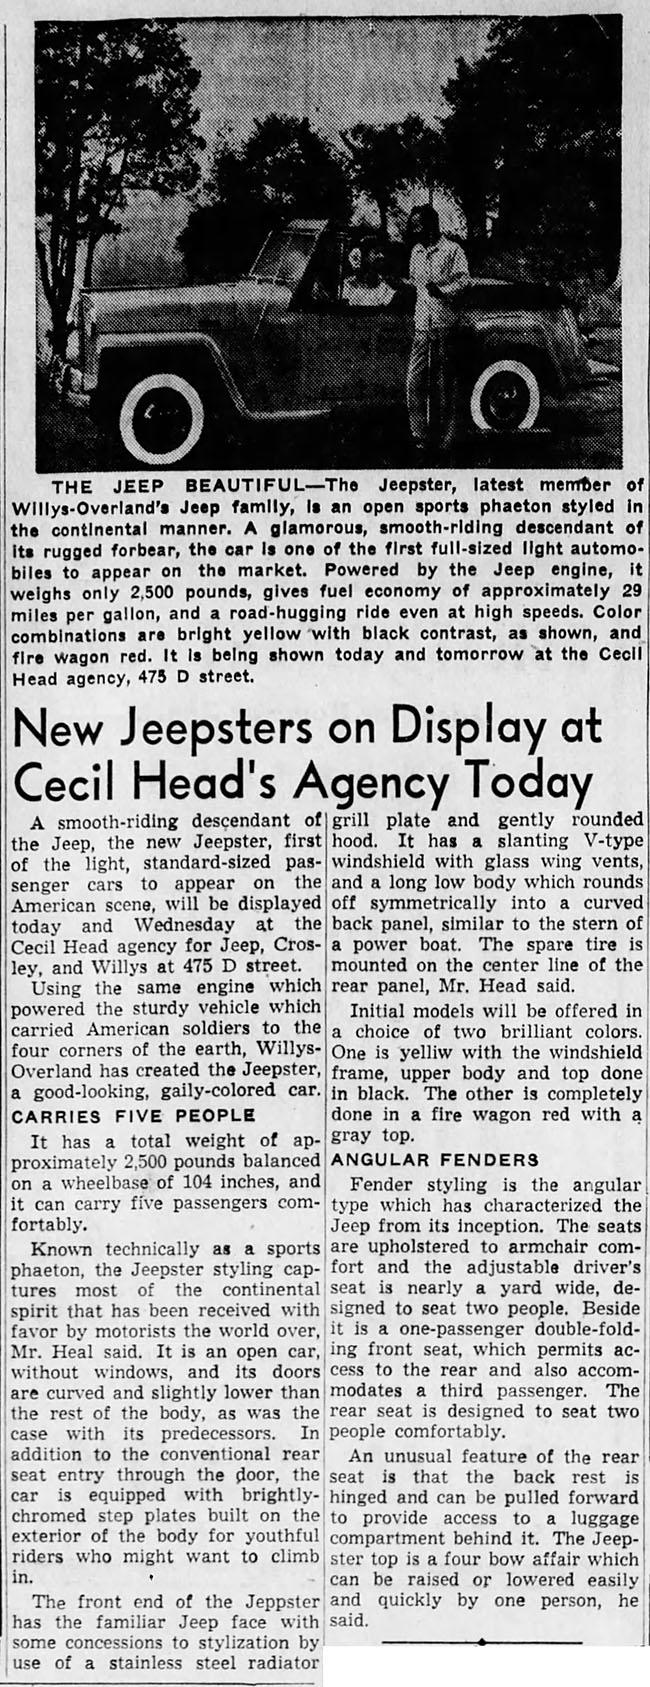 1948-07-27-san-bernardino-county-sun-new-jeepster-lores